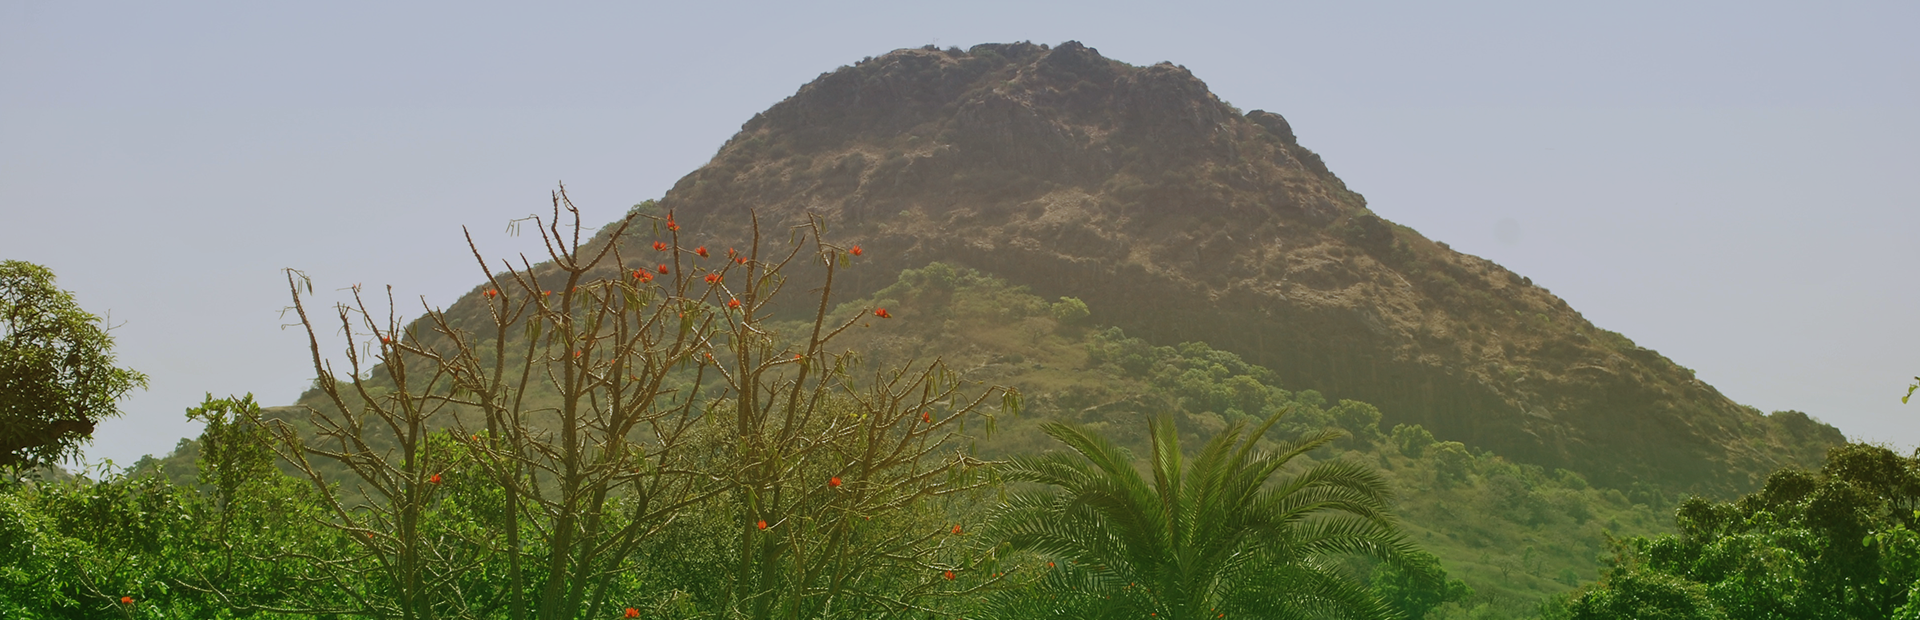 Mt-abu-trek